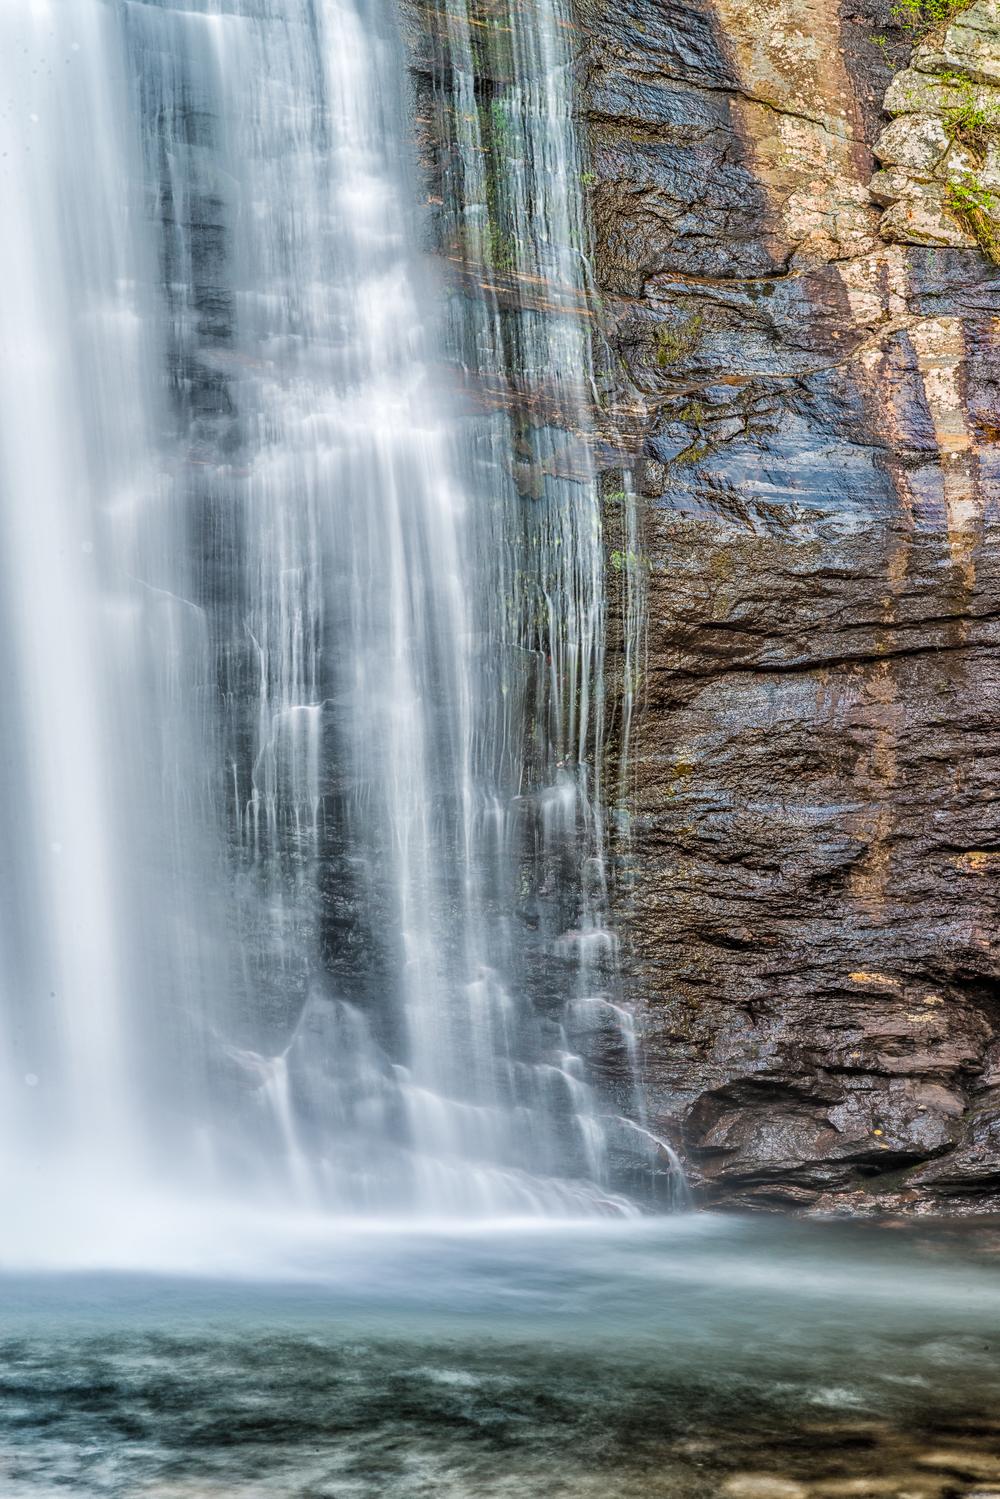 NC-Waterfalls-20140054-A-A.jpg